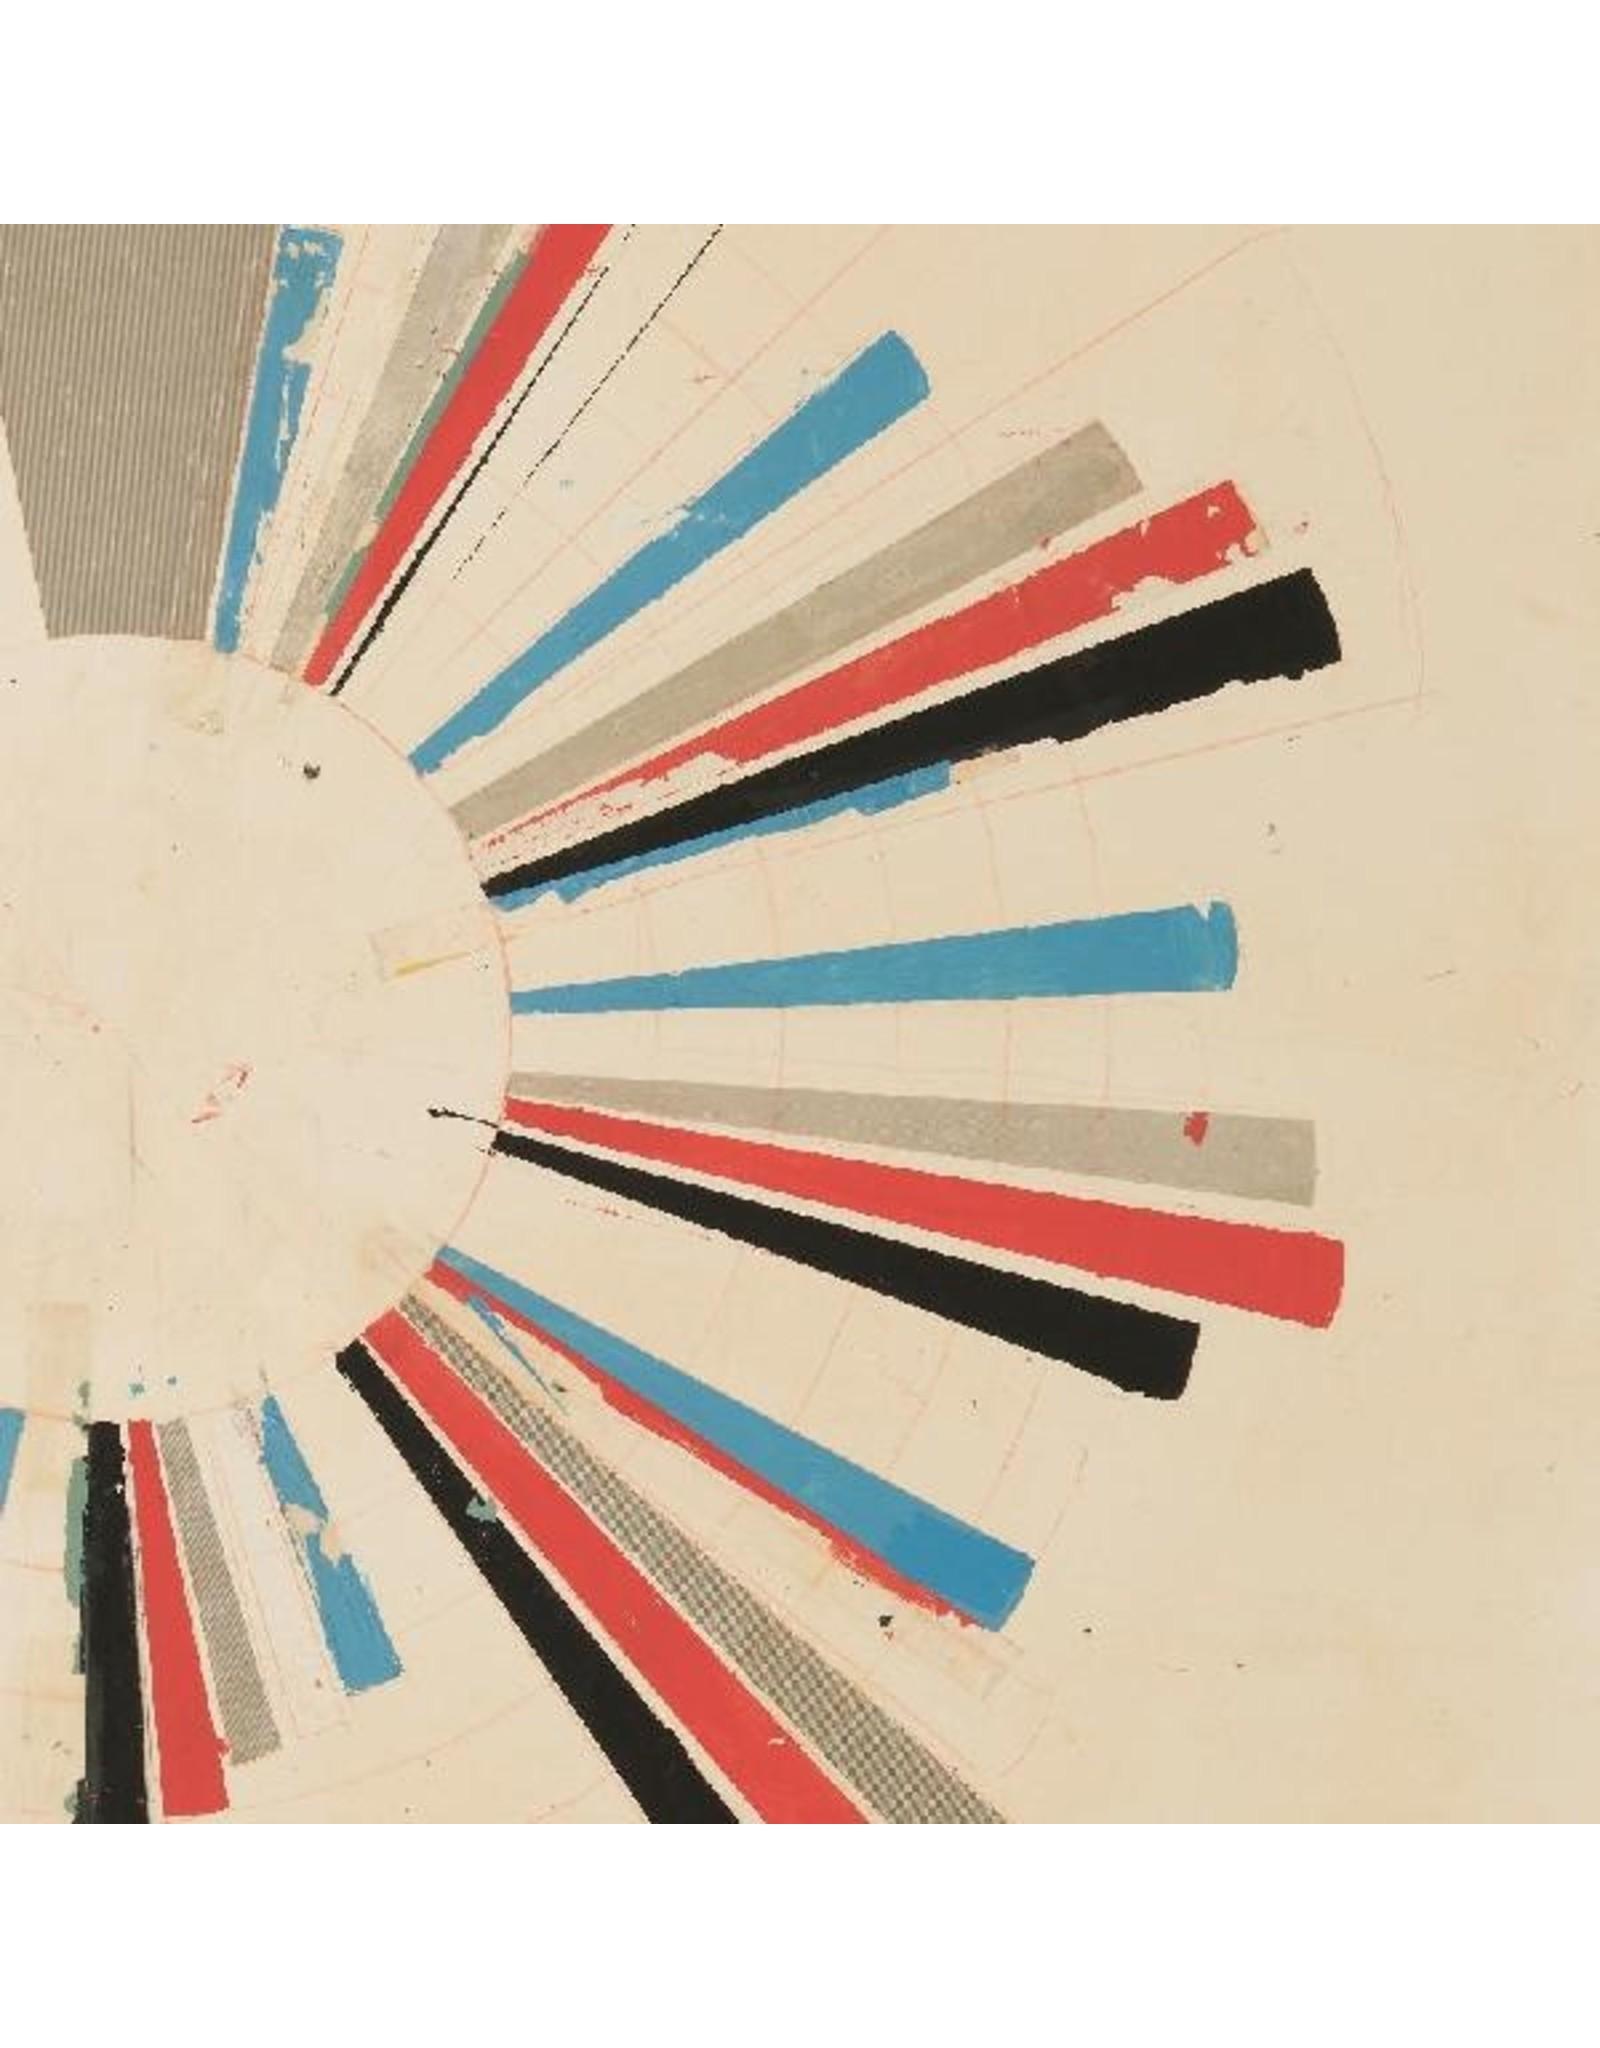 New Vinyl Land Of Talk - Indistinct Conversations (Colored) LP